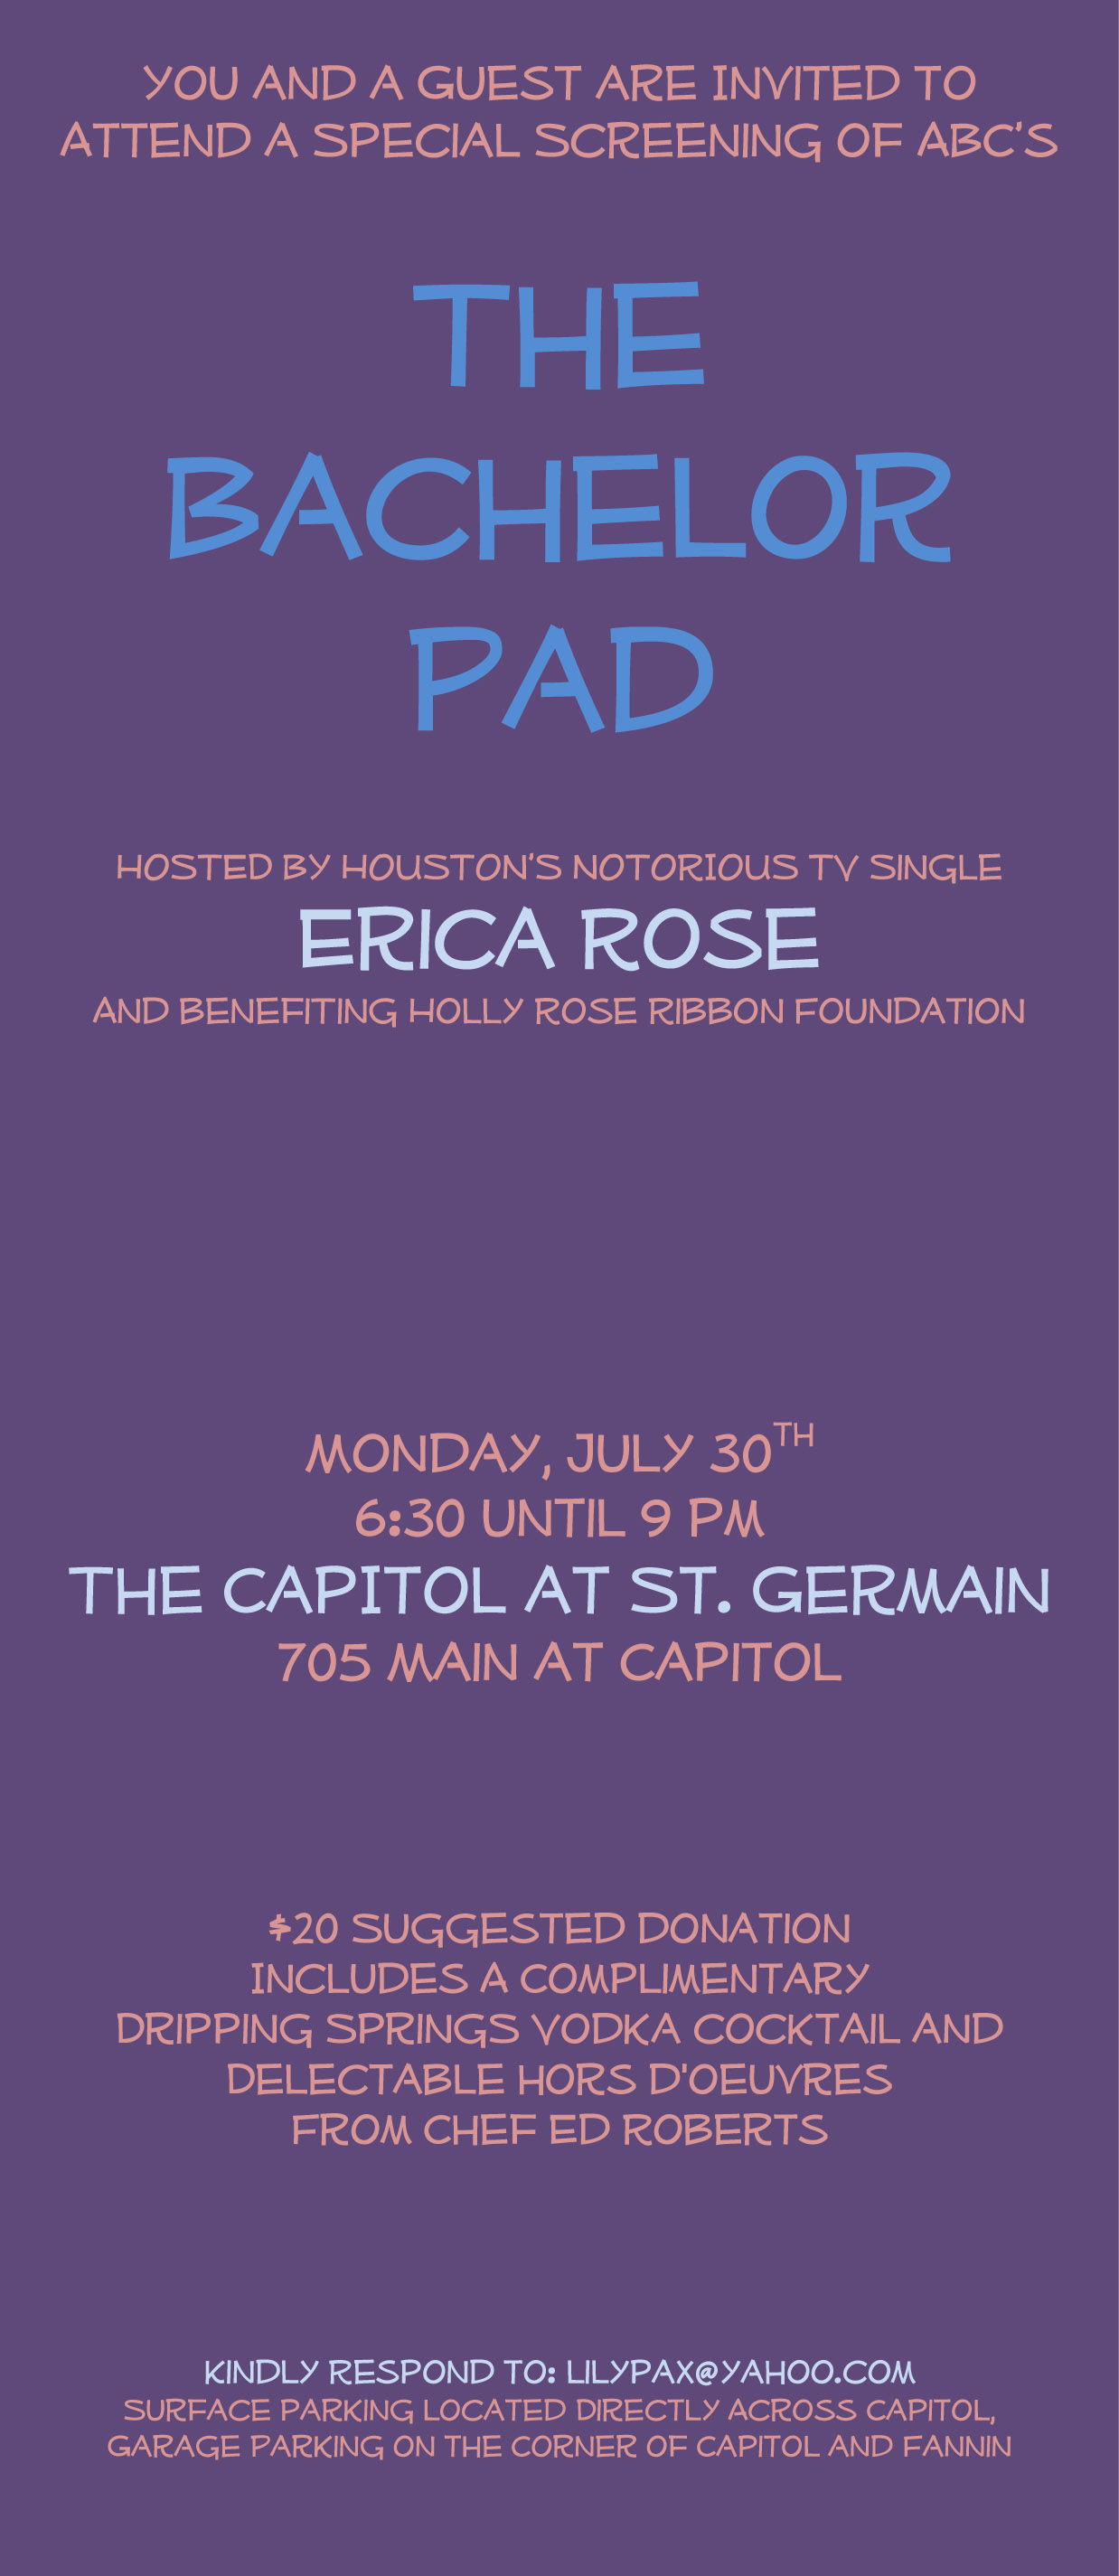 Bachelor Pad Erica Rose Invite 2012